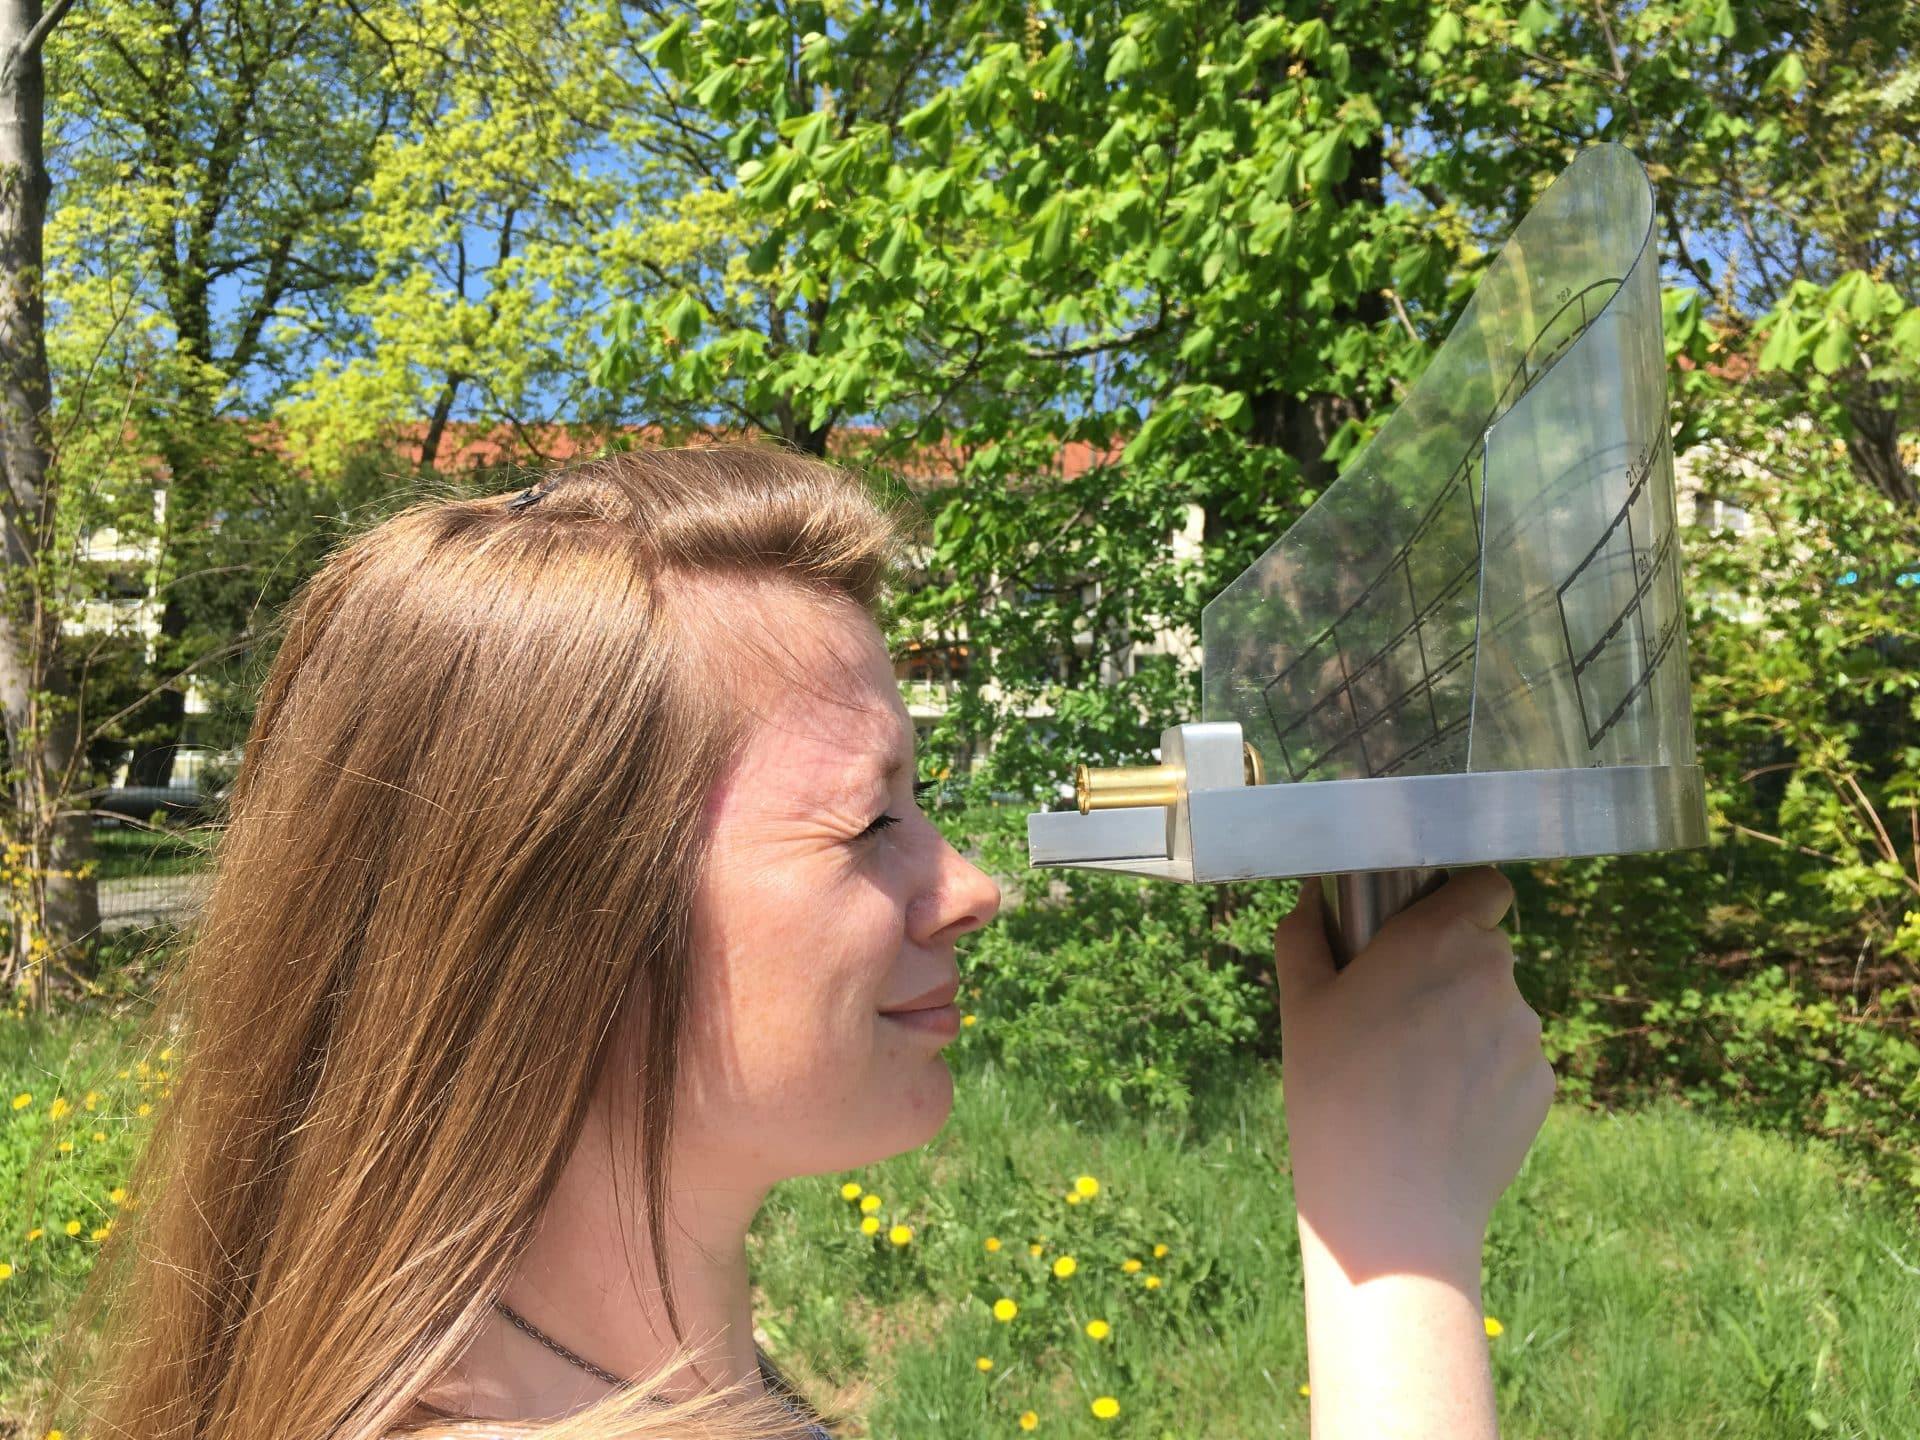 Solaranalyse Handgeraet